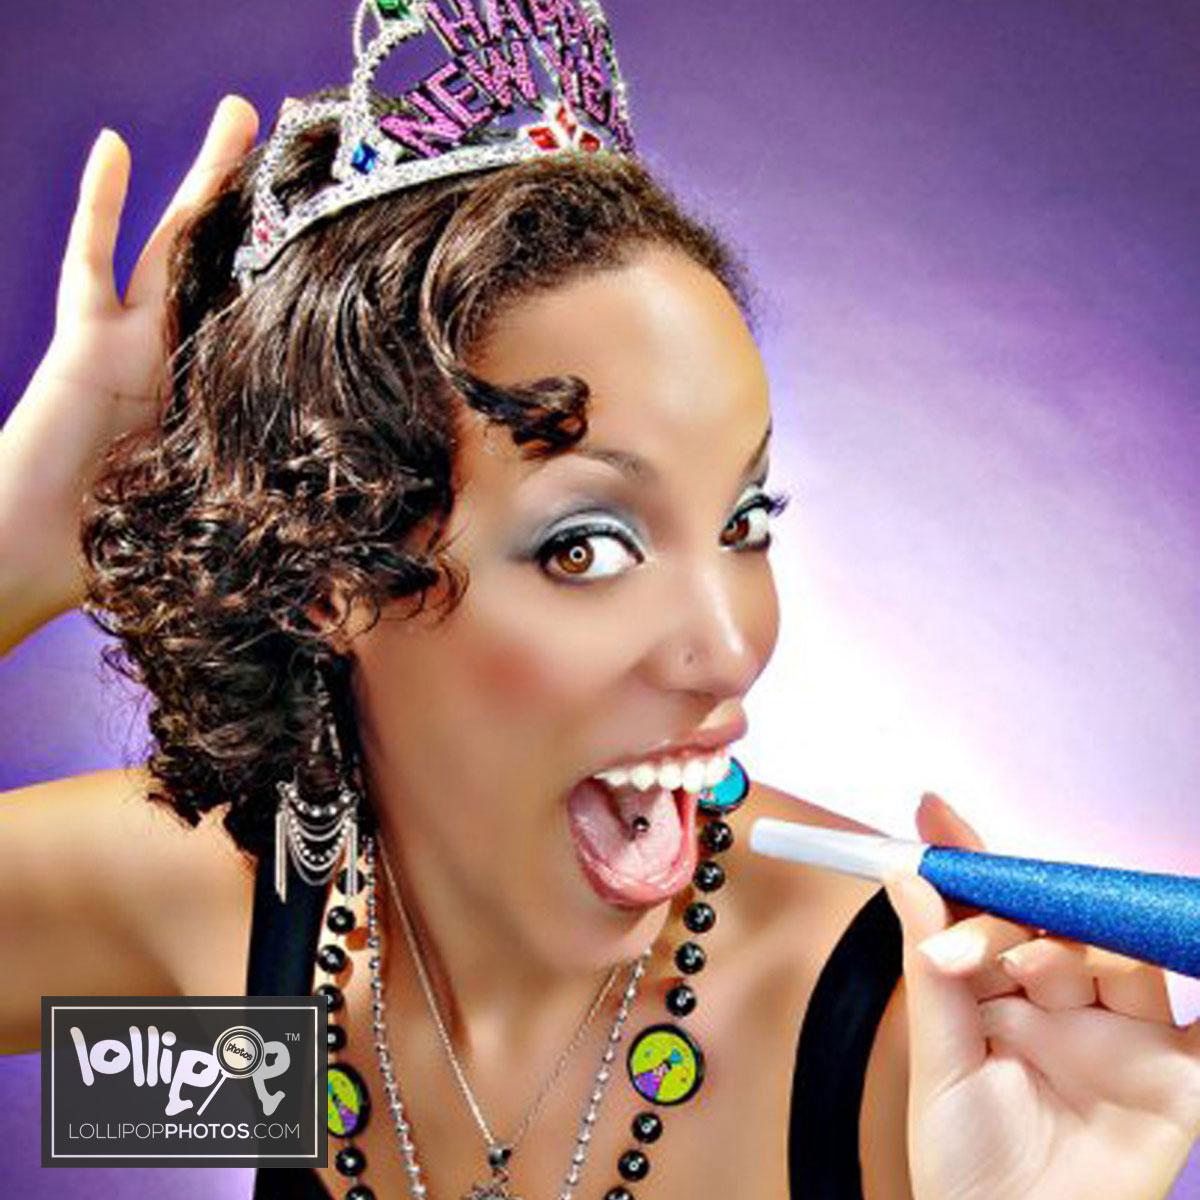 msdig-nora-canfield-lollipop-photos-025.jpg